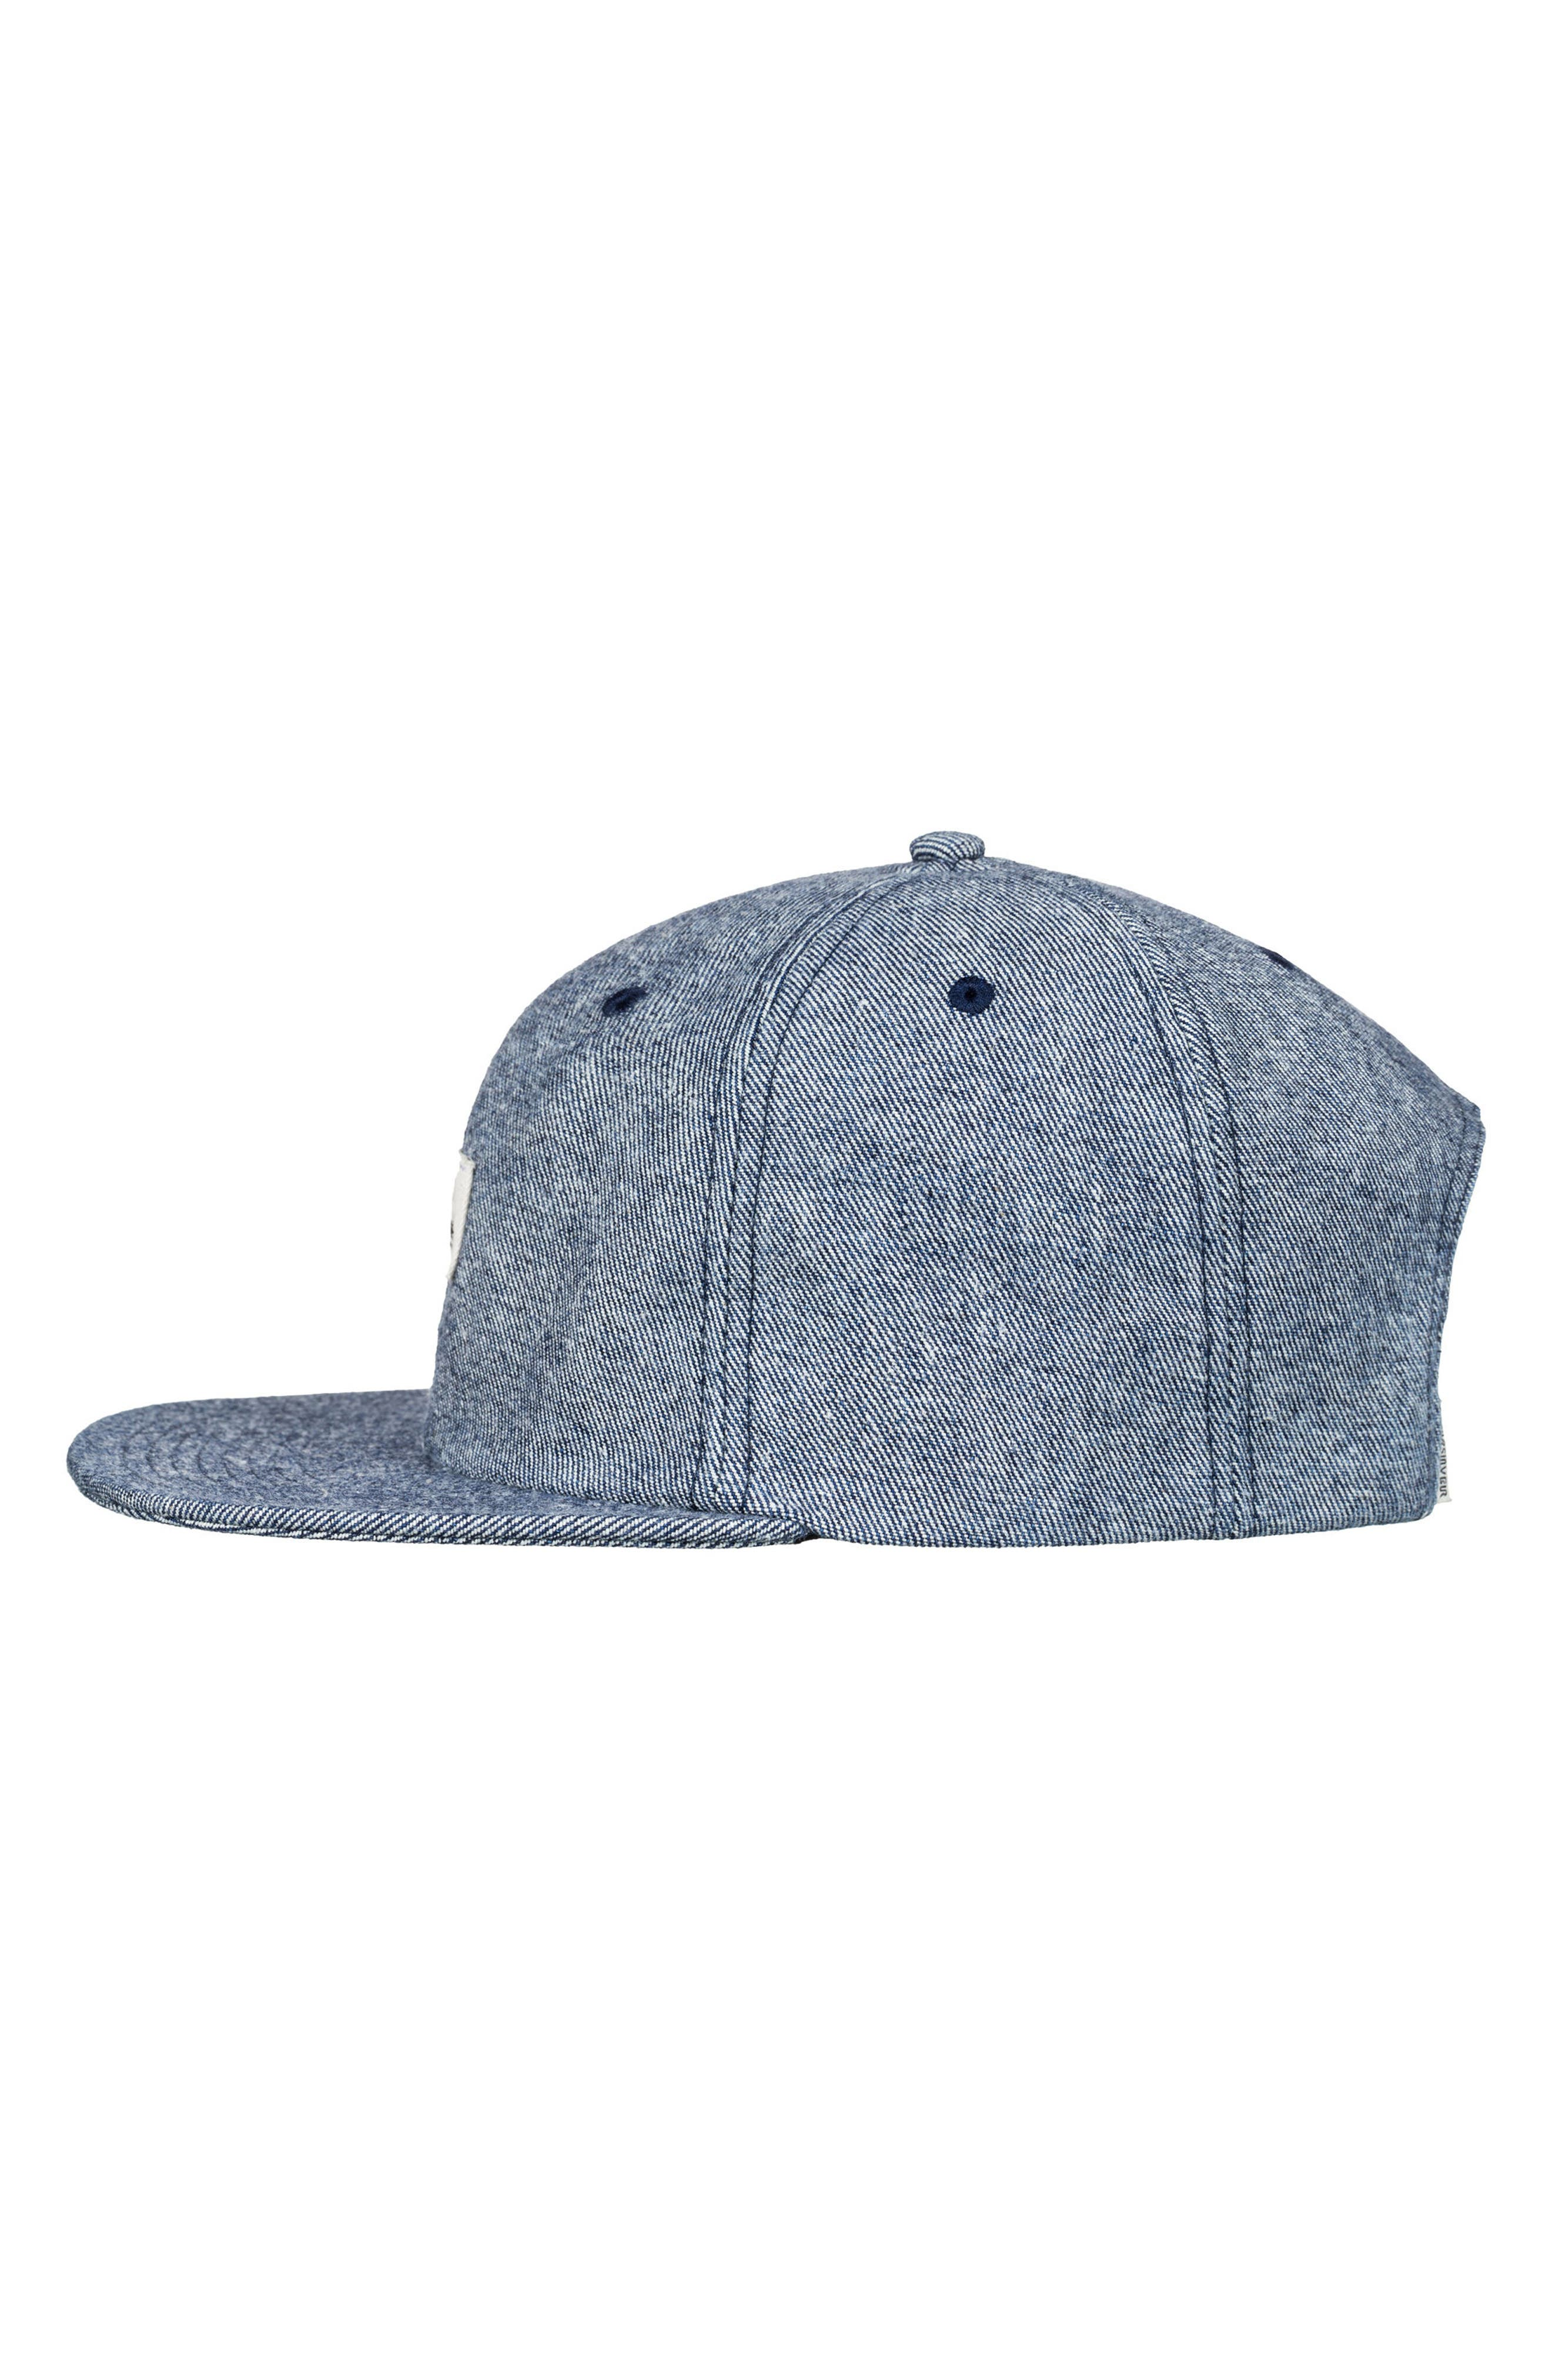 Pinchfield Snapback Baseball Cap,                             Alternate thumbnail 3, color,